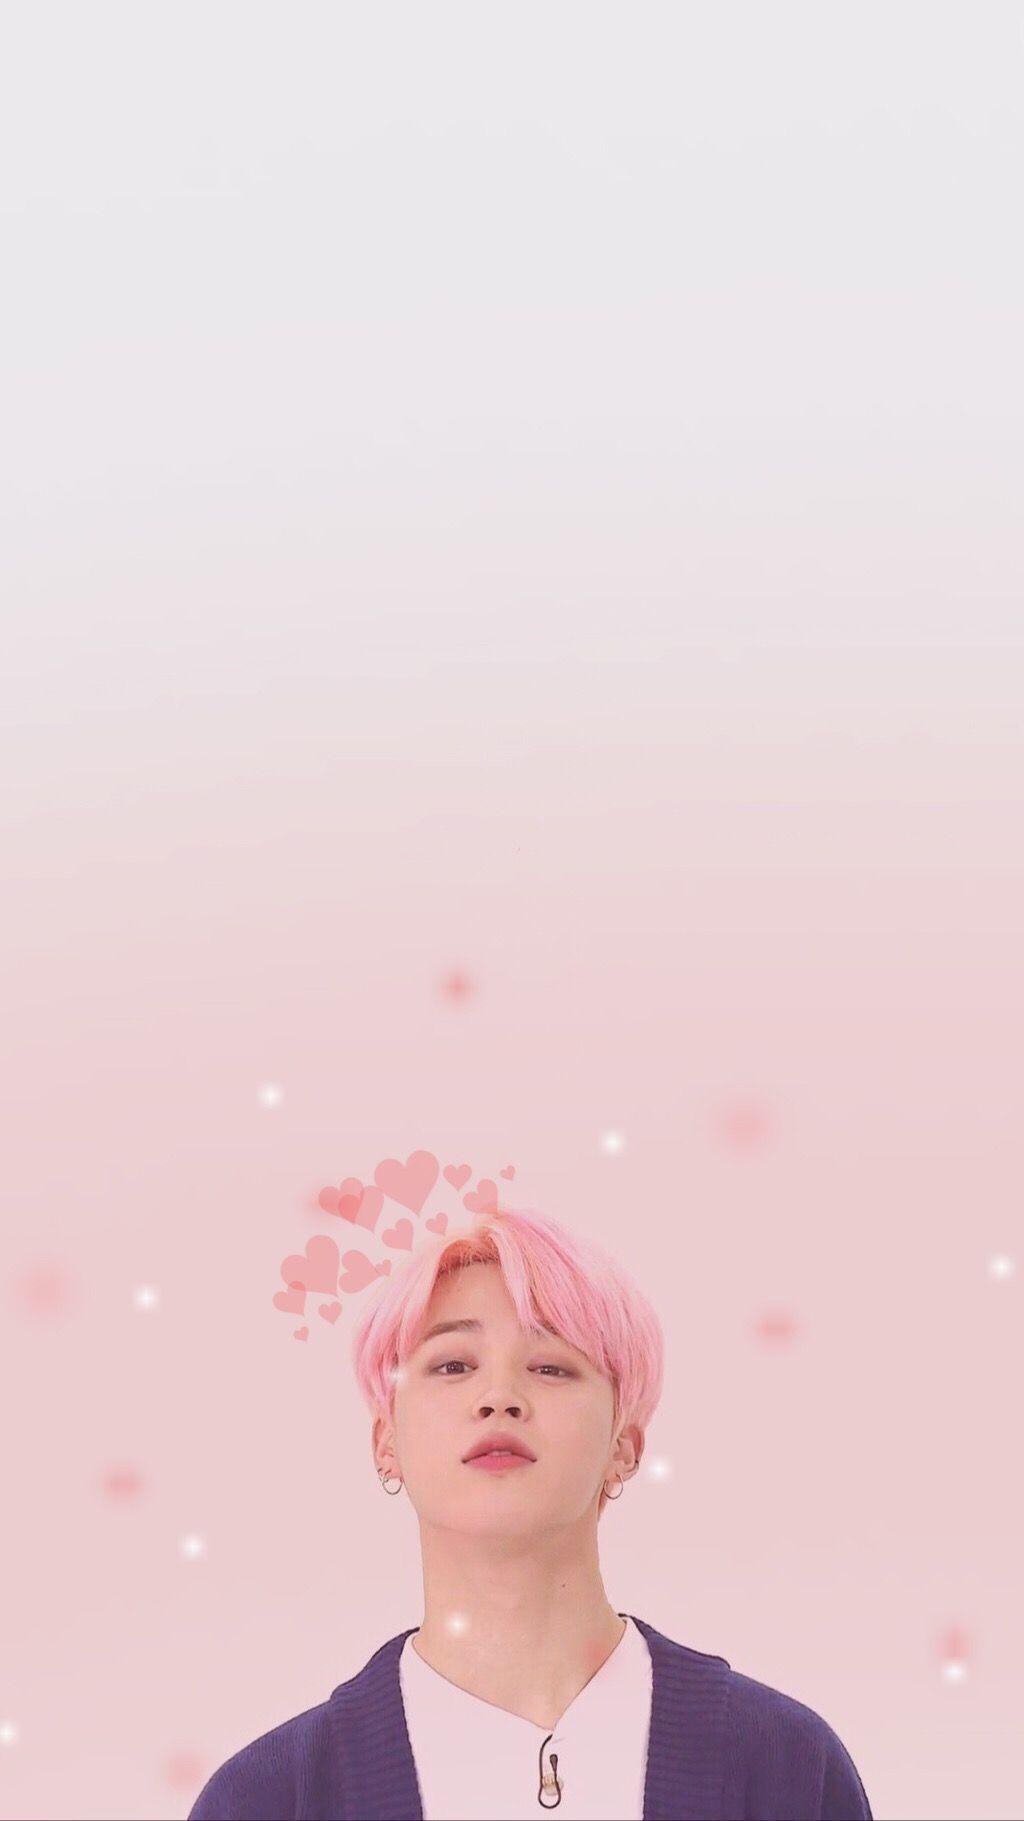 Gambar Wallpaper Pink